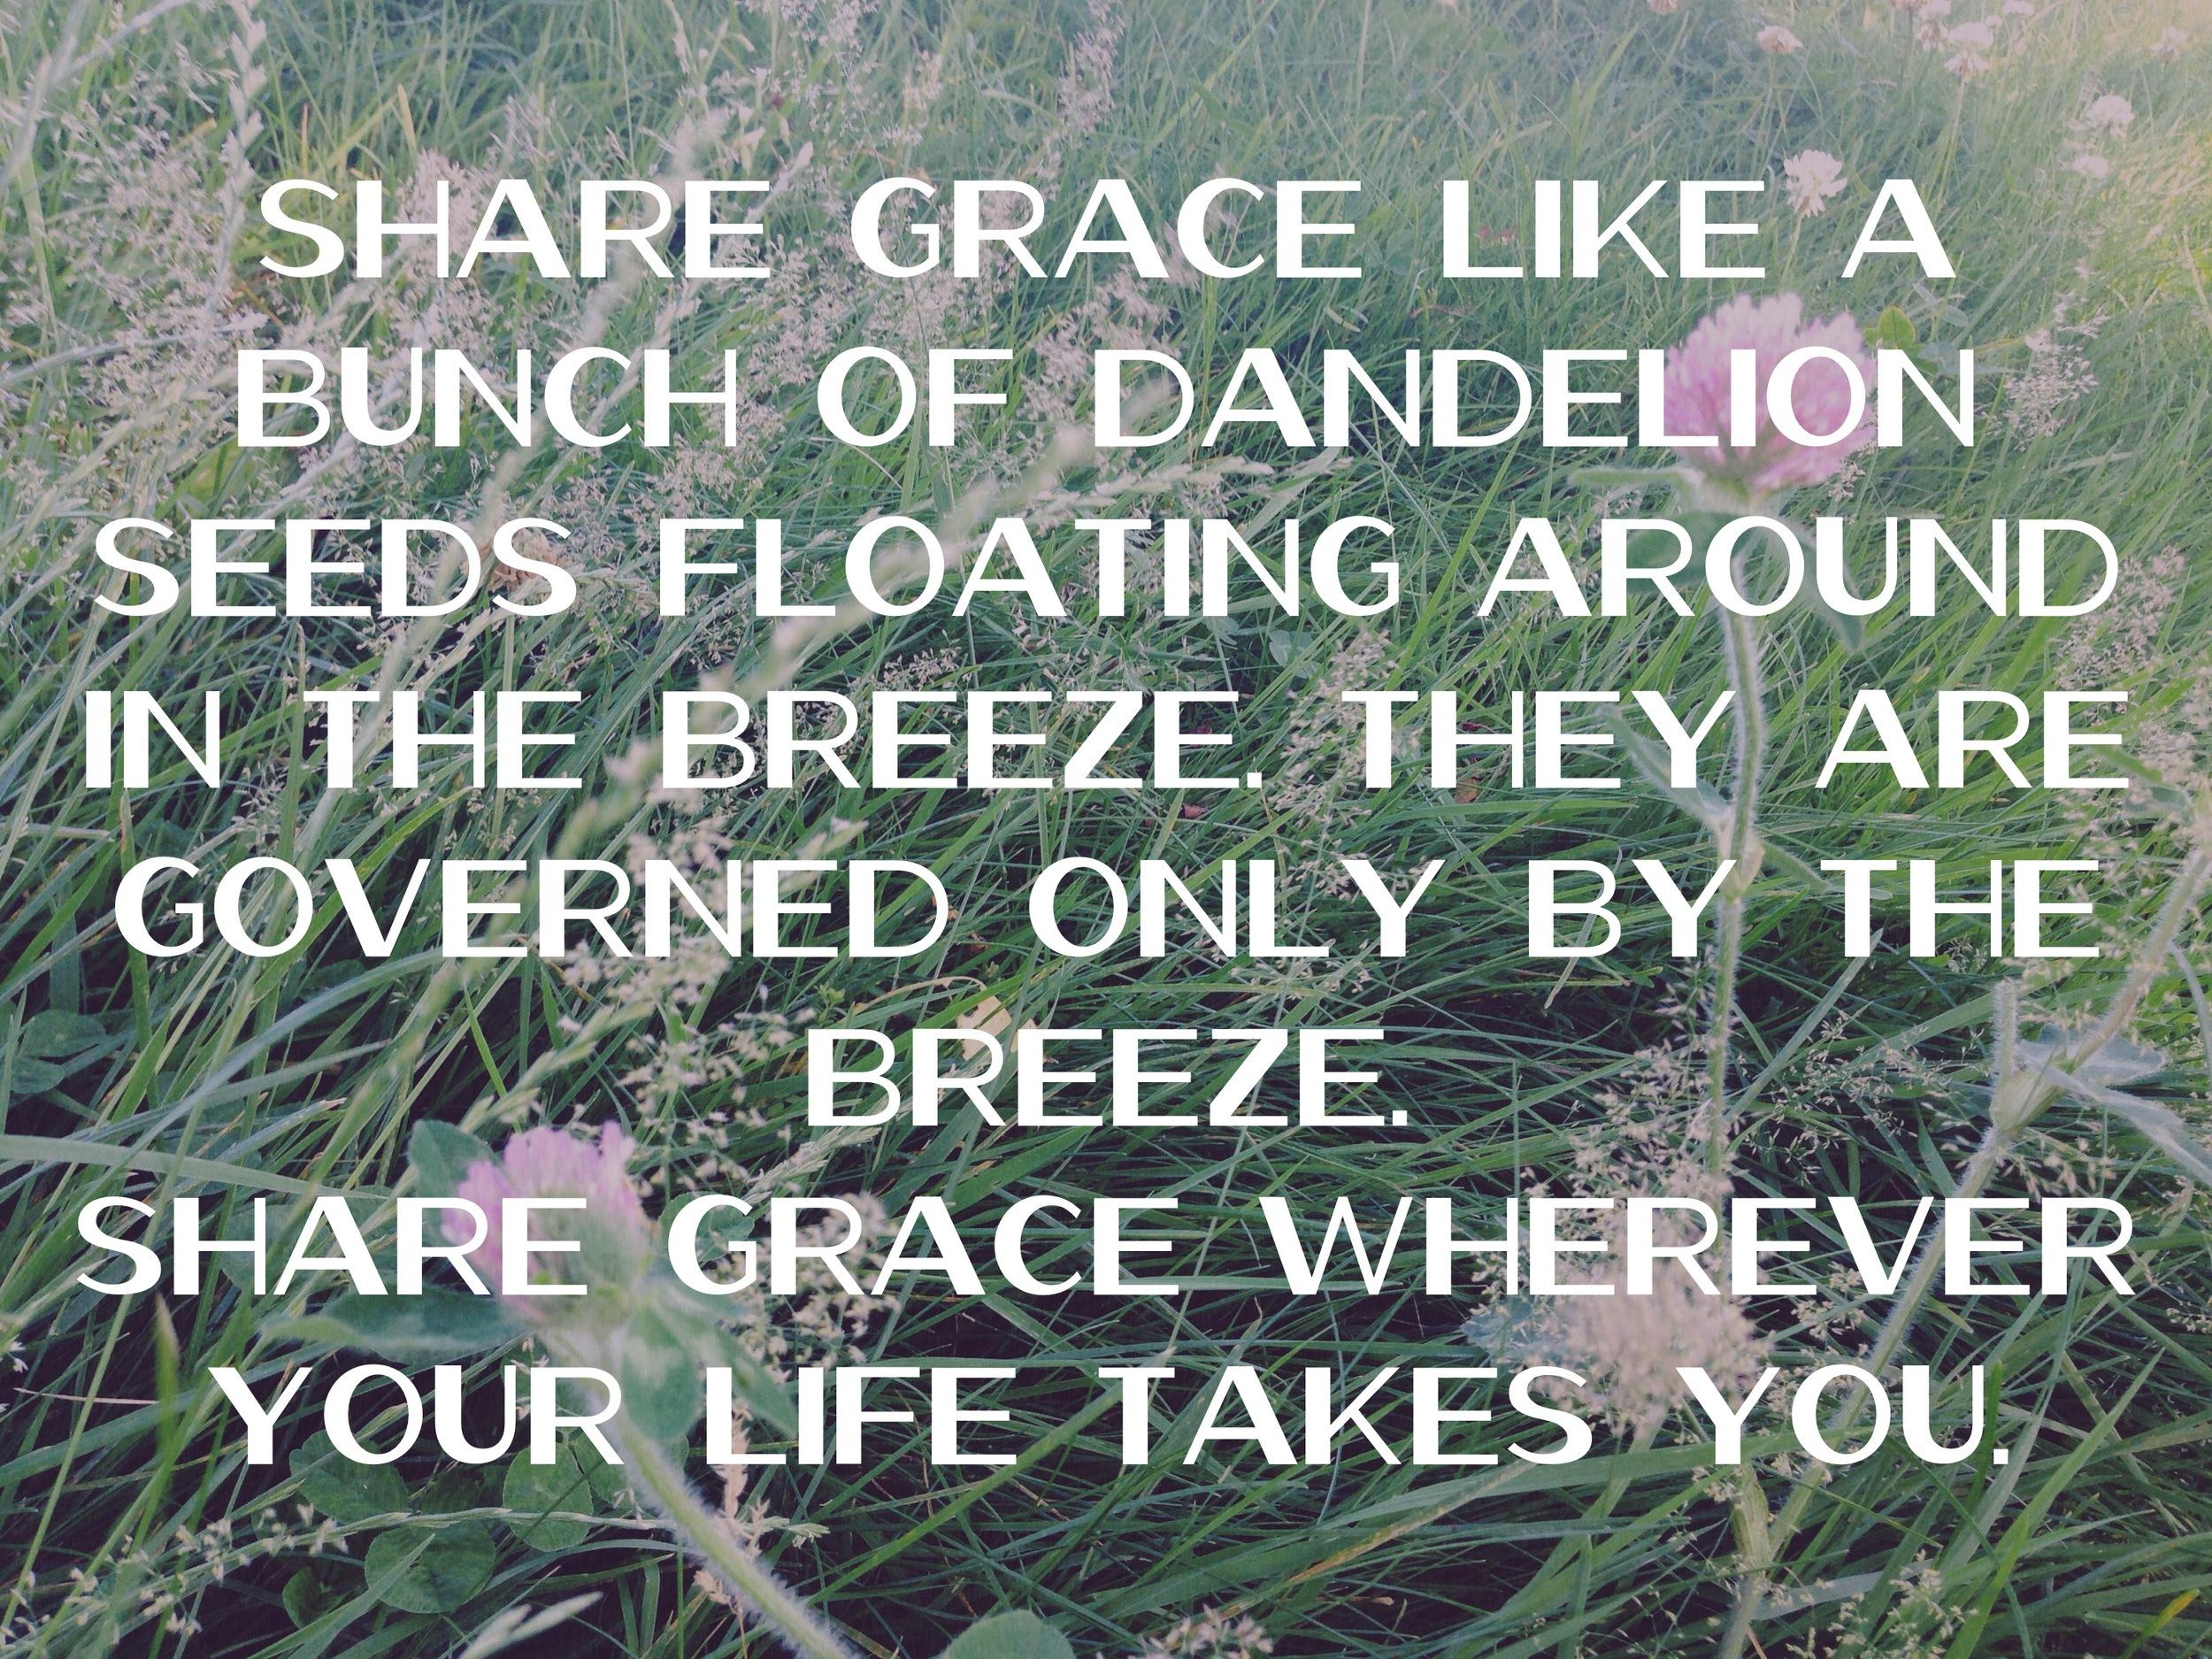 Share grace like danelion seeds floating around in the breeze via nadinewouldsay